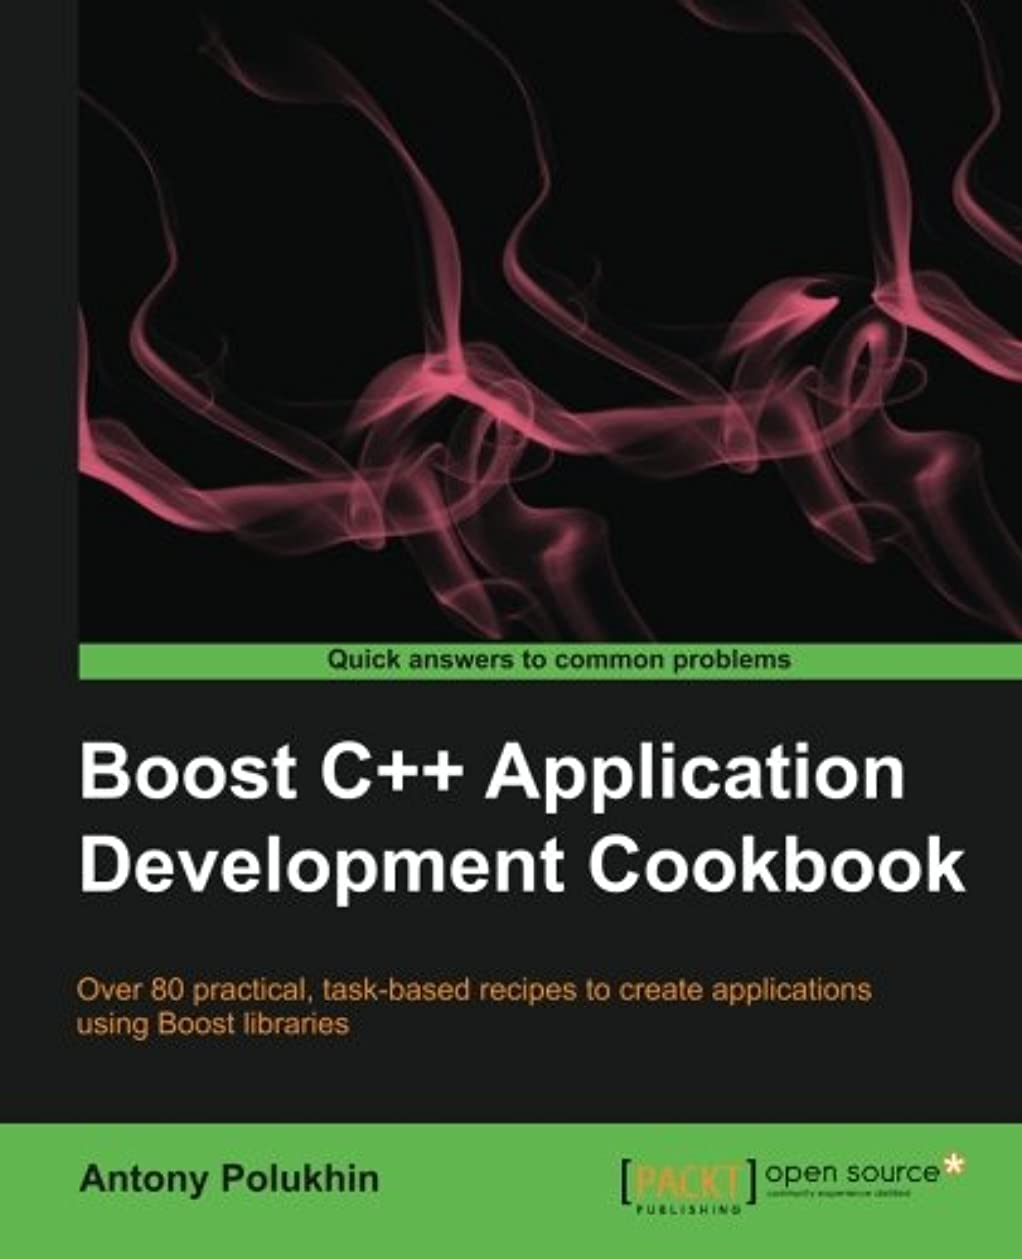 浮浪者神億Boost C++ Application Development Cookbook